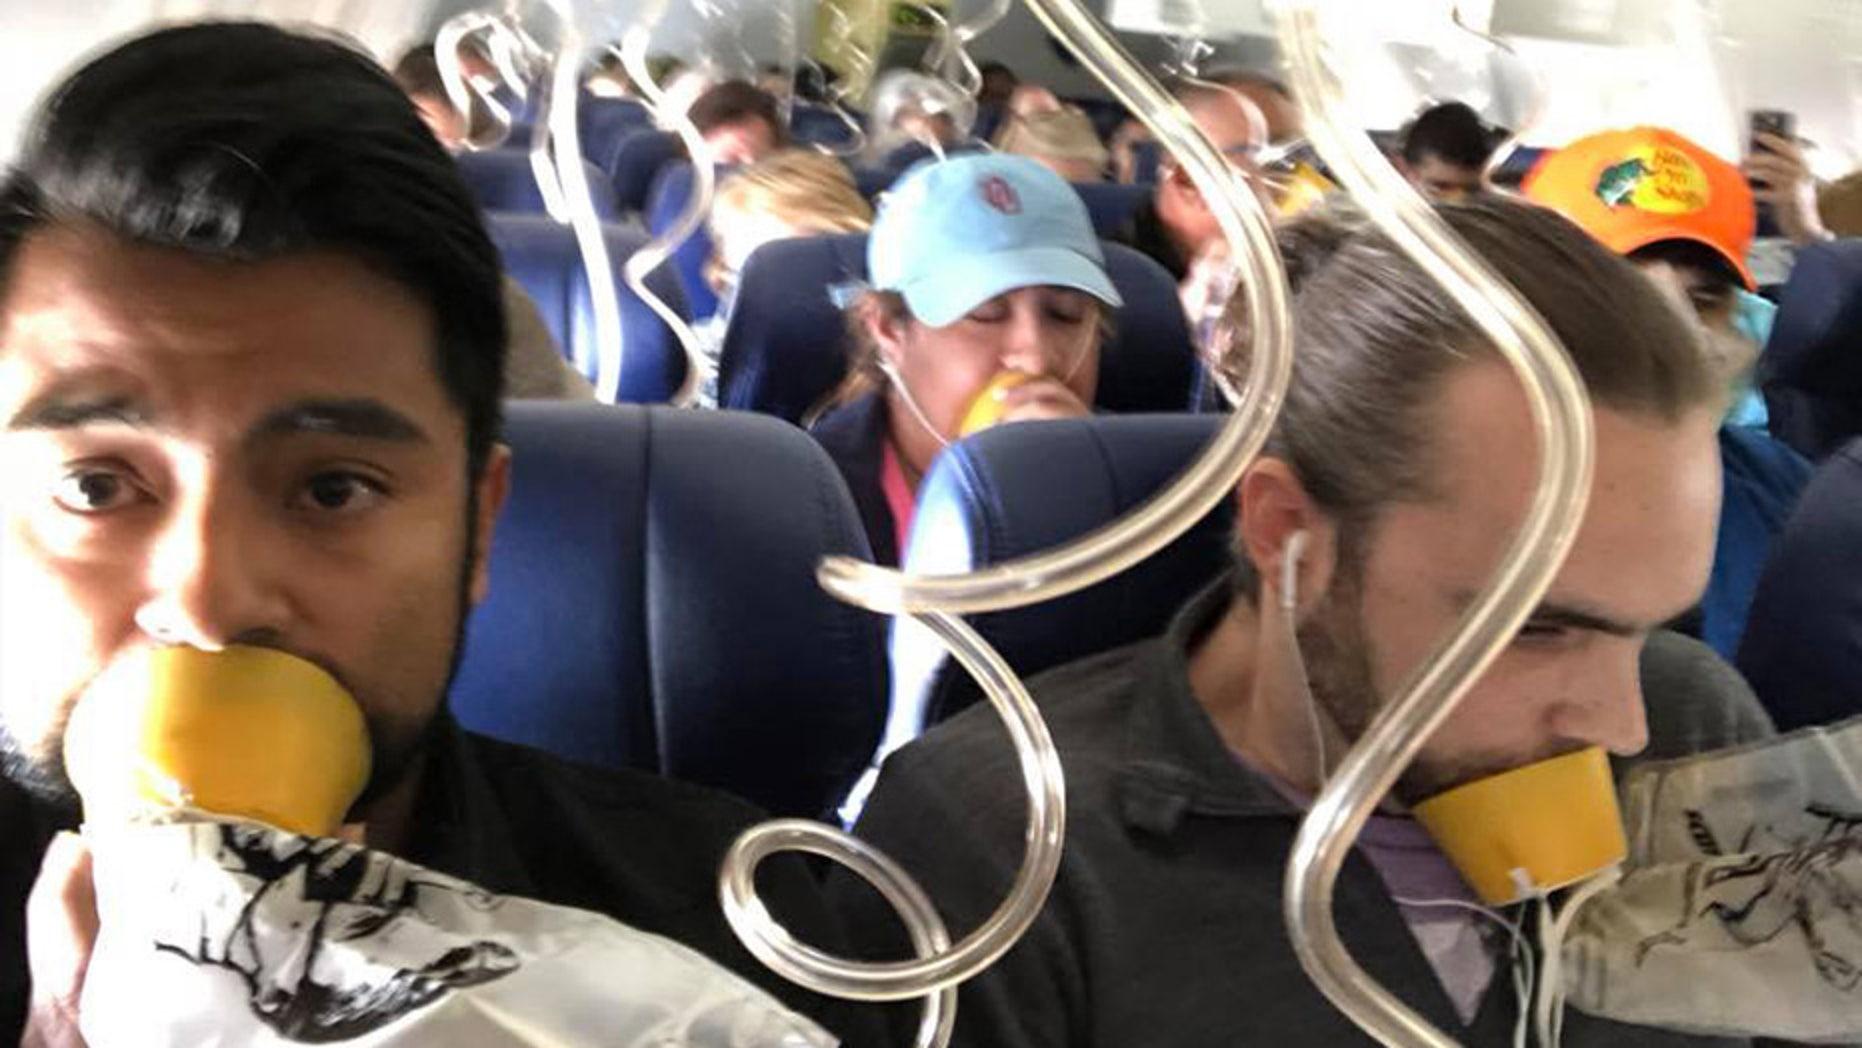 Passenger Marty Martinez captured the moment when oxygen masks were deployed on the flight.